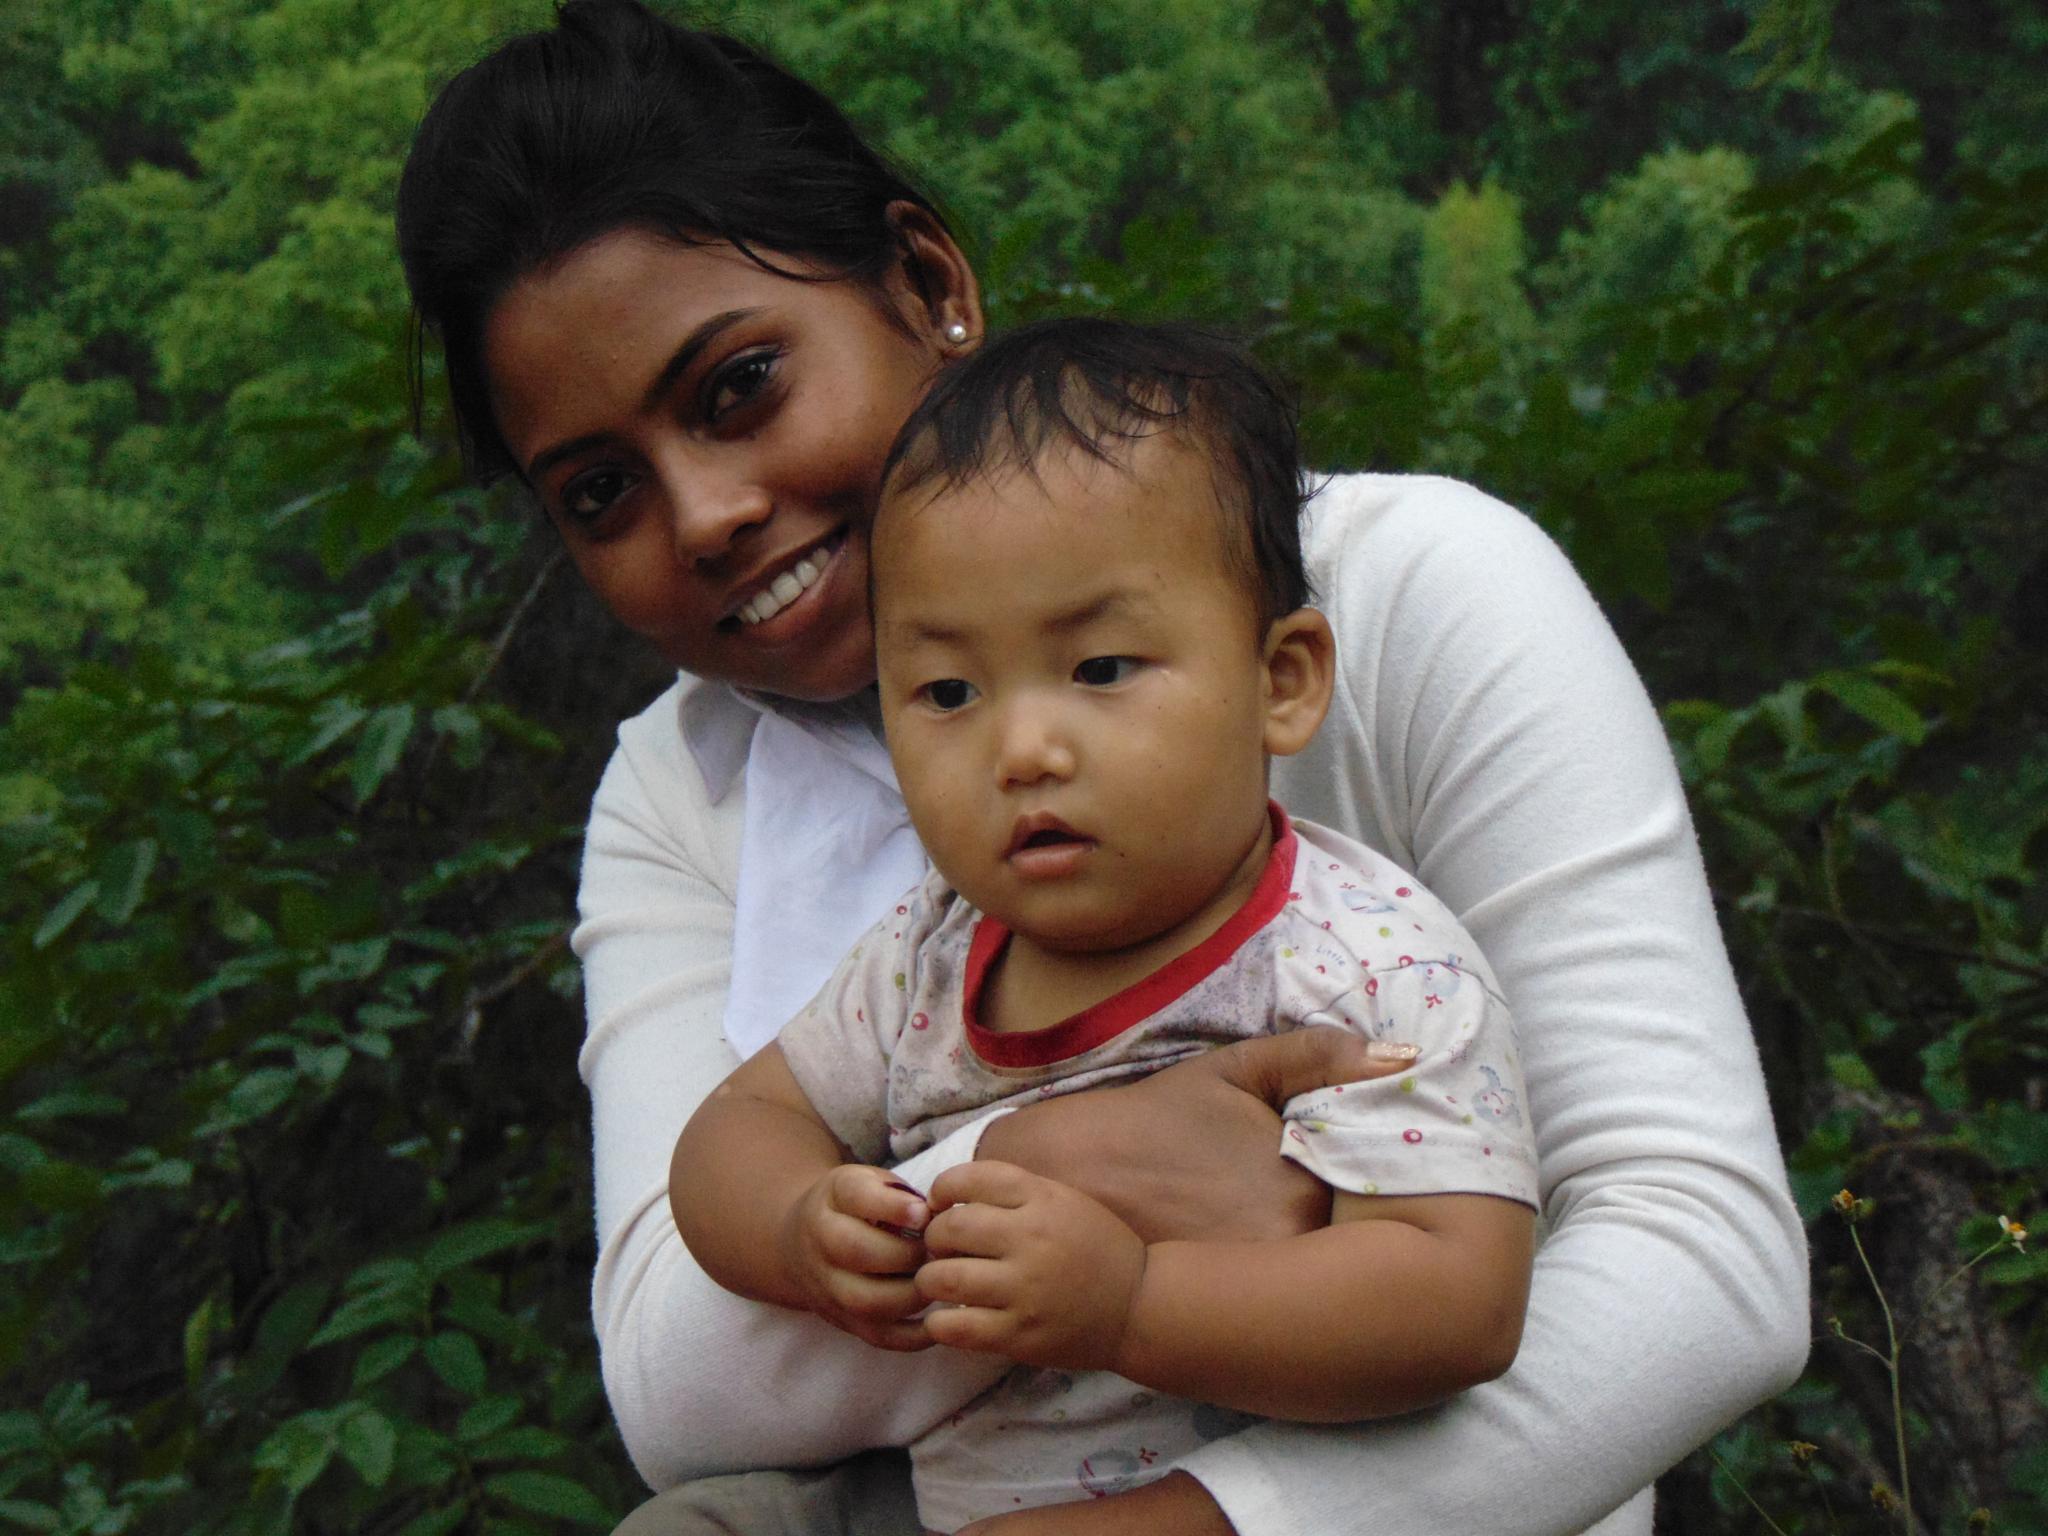 THE FEELINGS by arindambhattacharya007